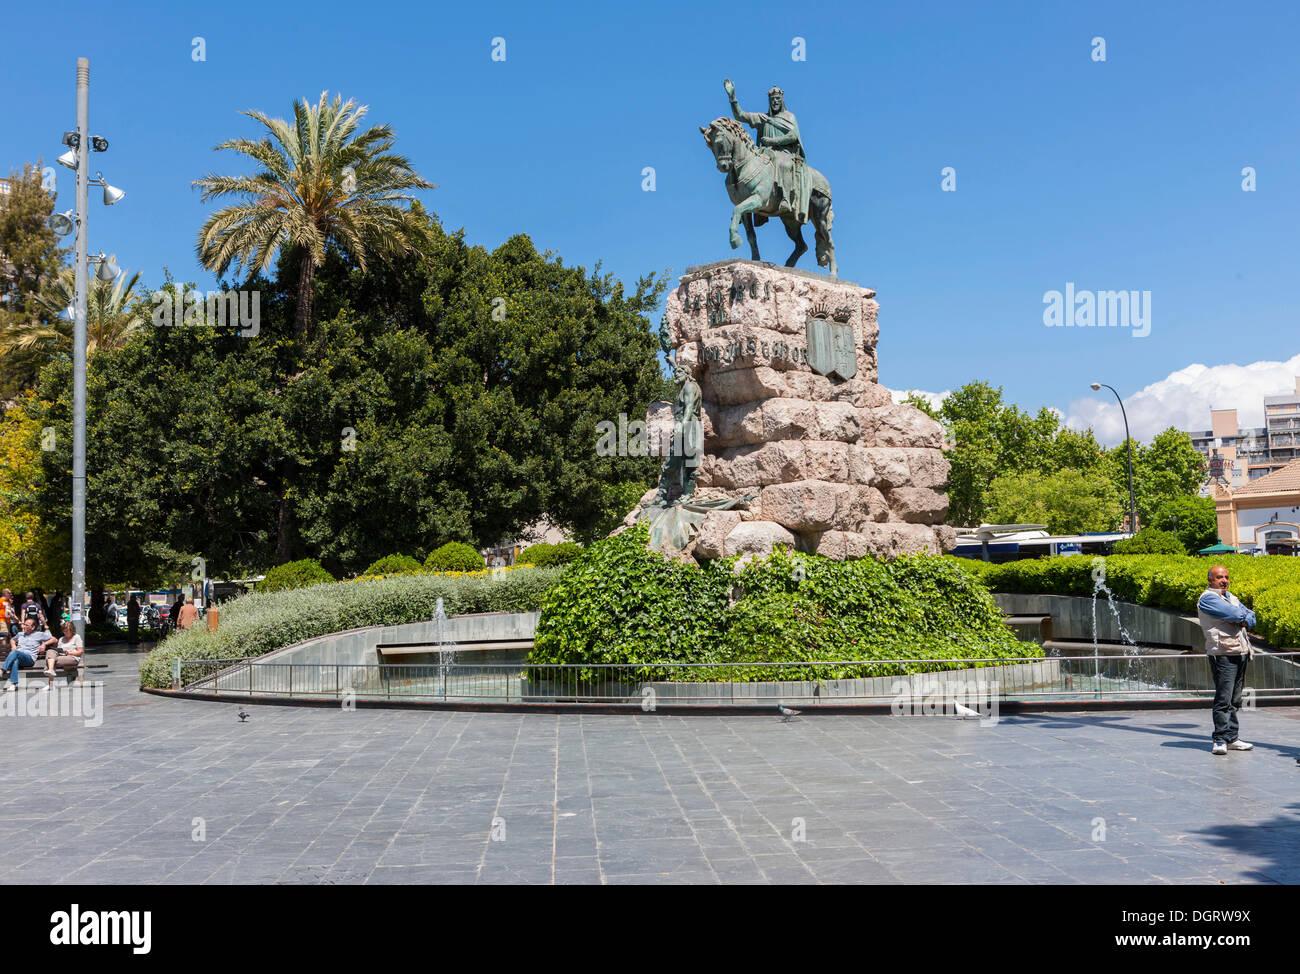 Town centre of Palma, Plaça d'Espanya, old town, Ciutat Antiga, Palma de Mallorca, Majorca, Balearic Islands, Spain, Europe - Stock Image